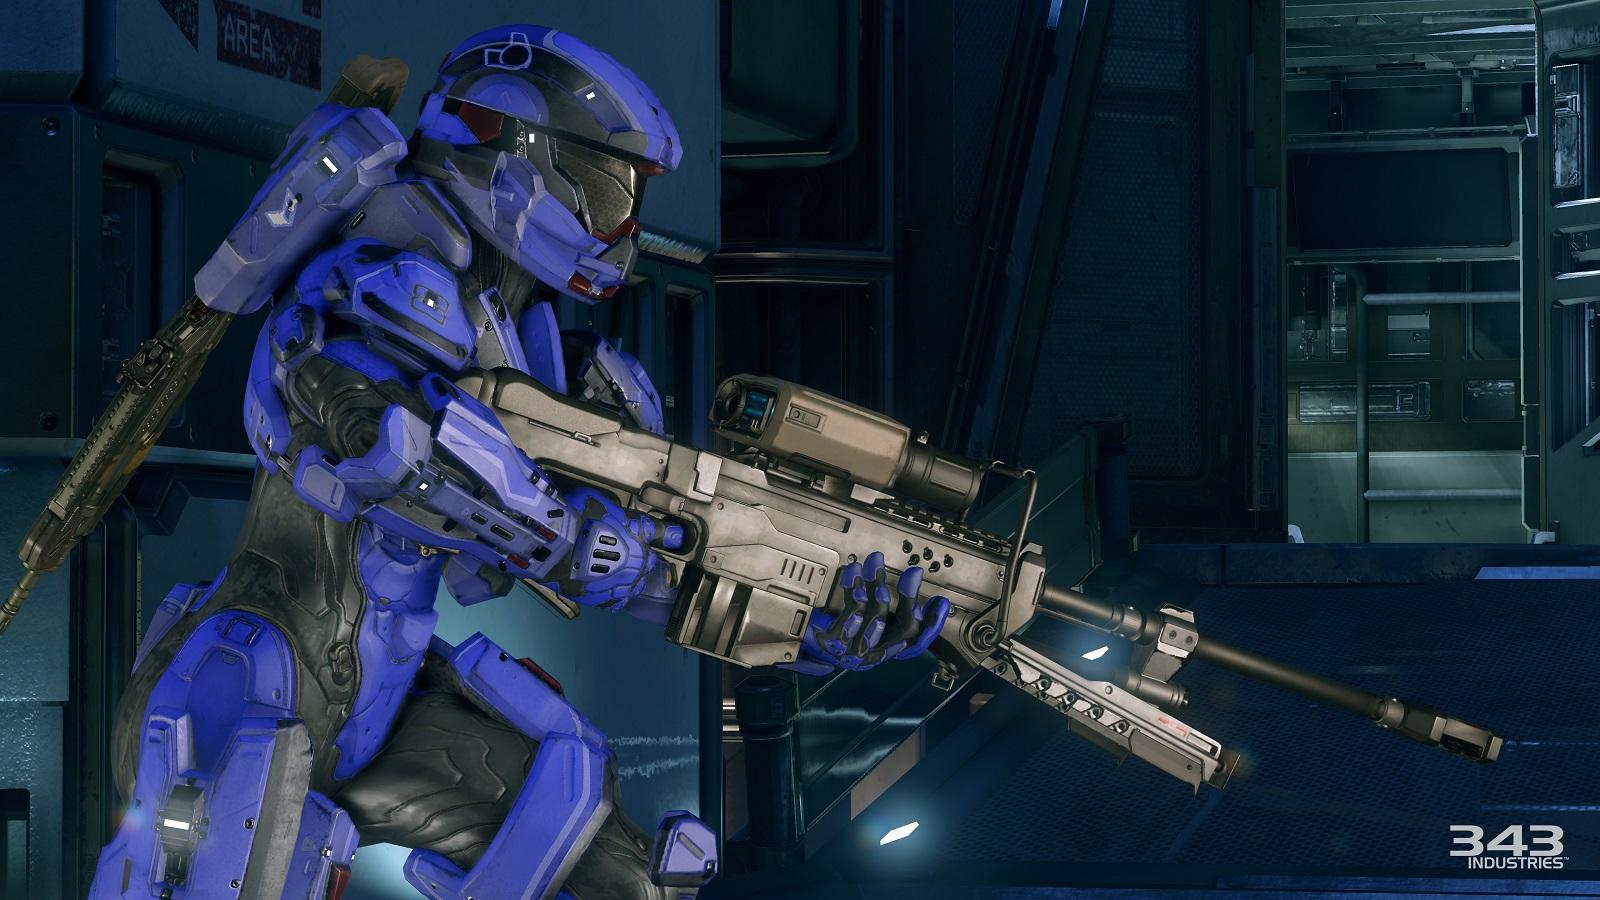 Halo 5 Guardians multiplayer beta hands on impressions Shacknews 1600x900